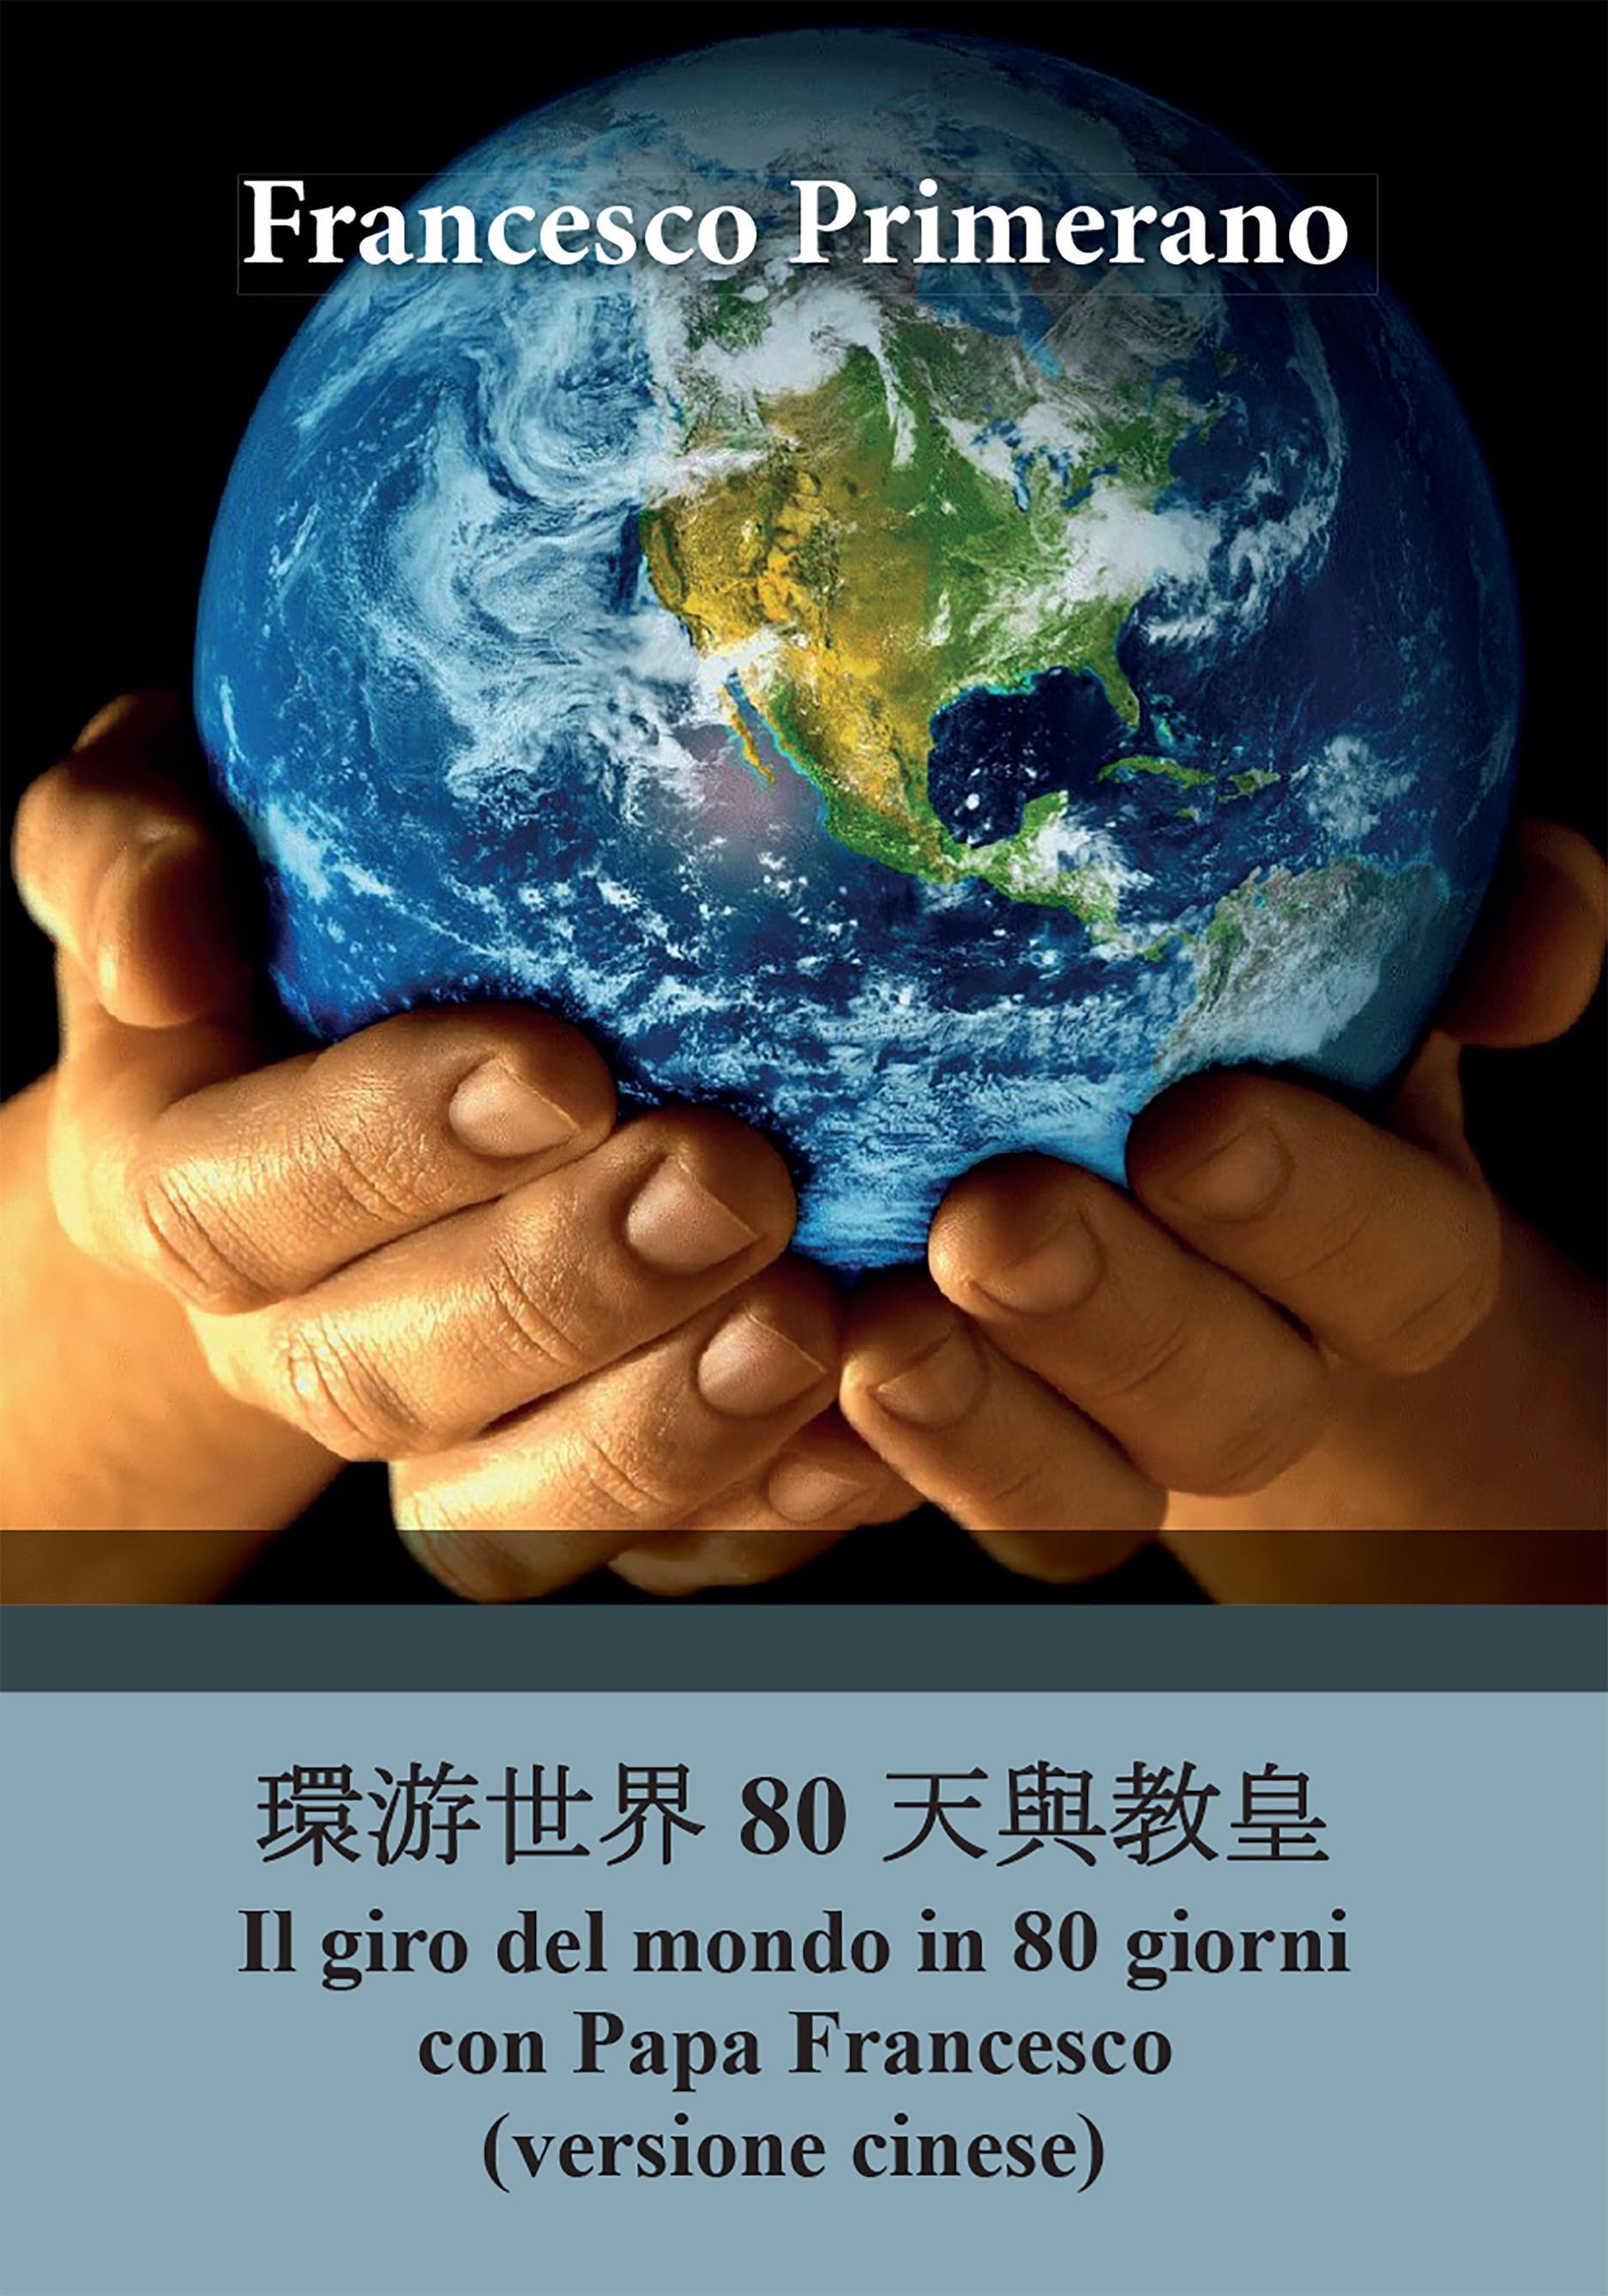 環游世界 80 天與教皇   Il giro del mondo in 80 giorni con Papa Francesco (versione cinese)